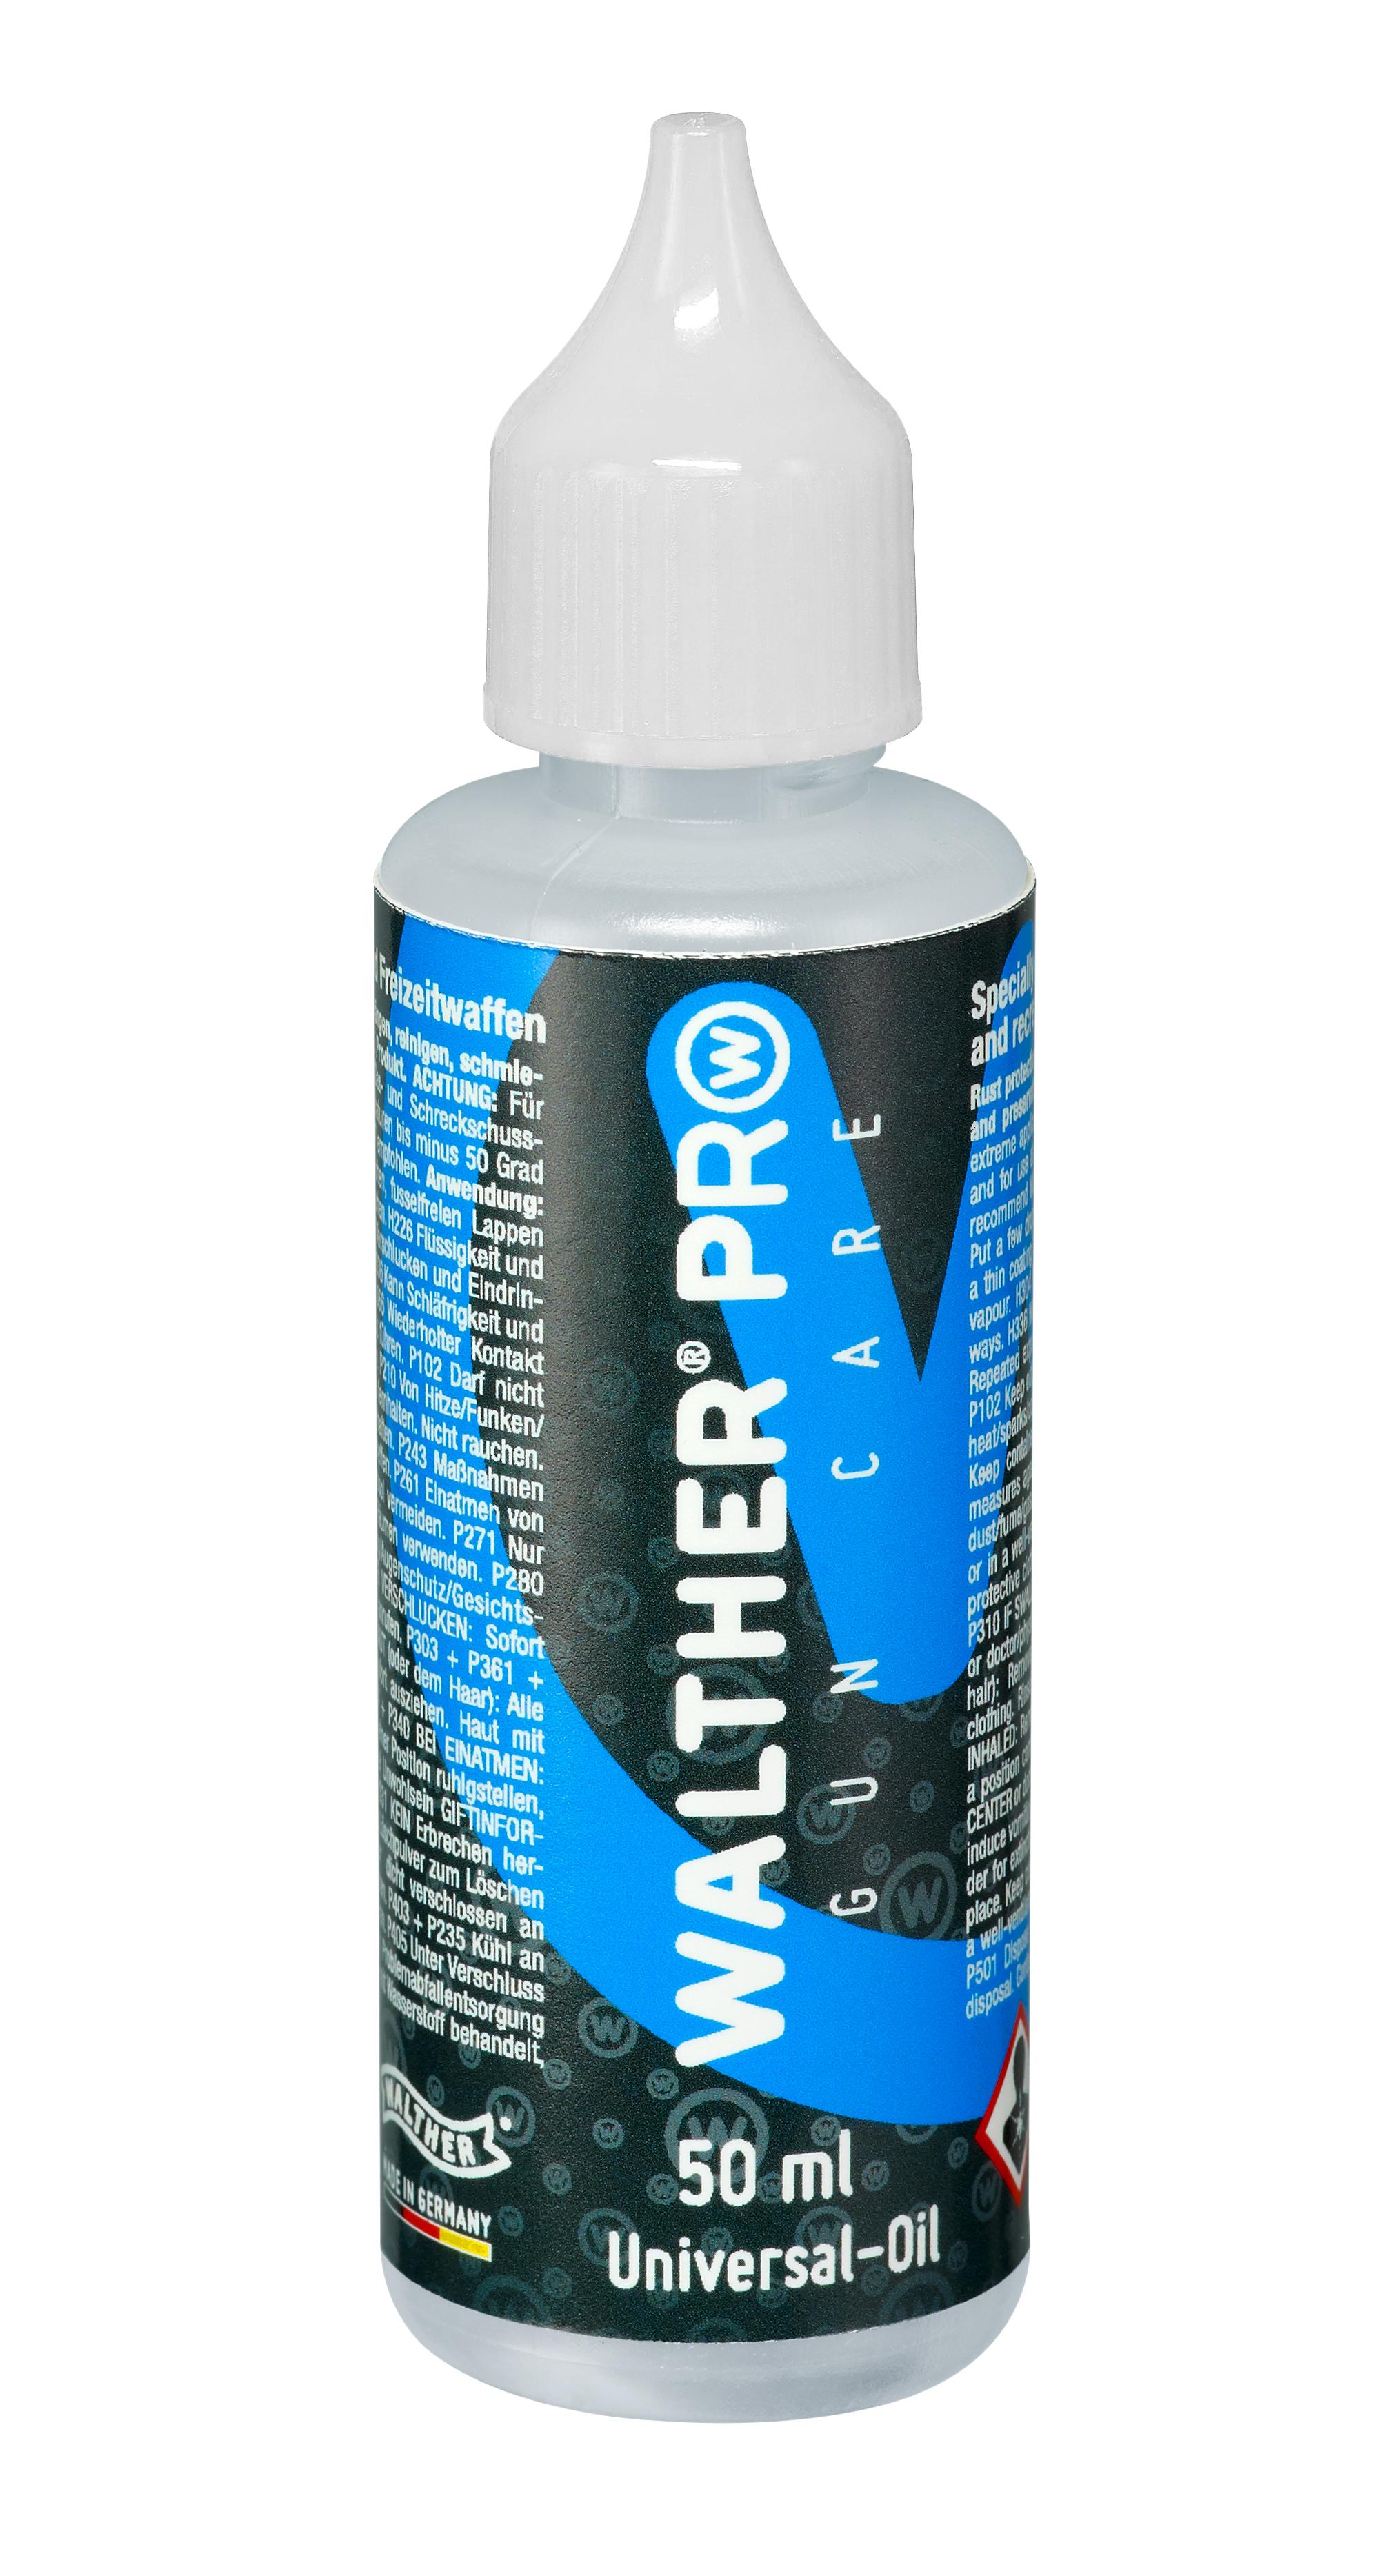 Walther Pro Gun Care Pro Öl, 50ml